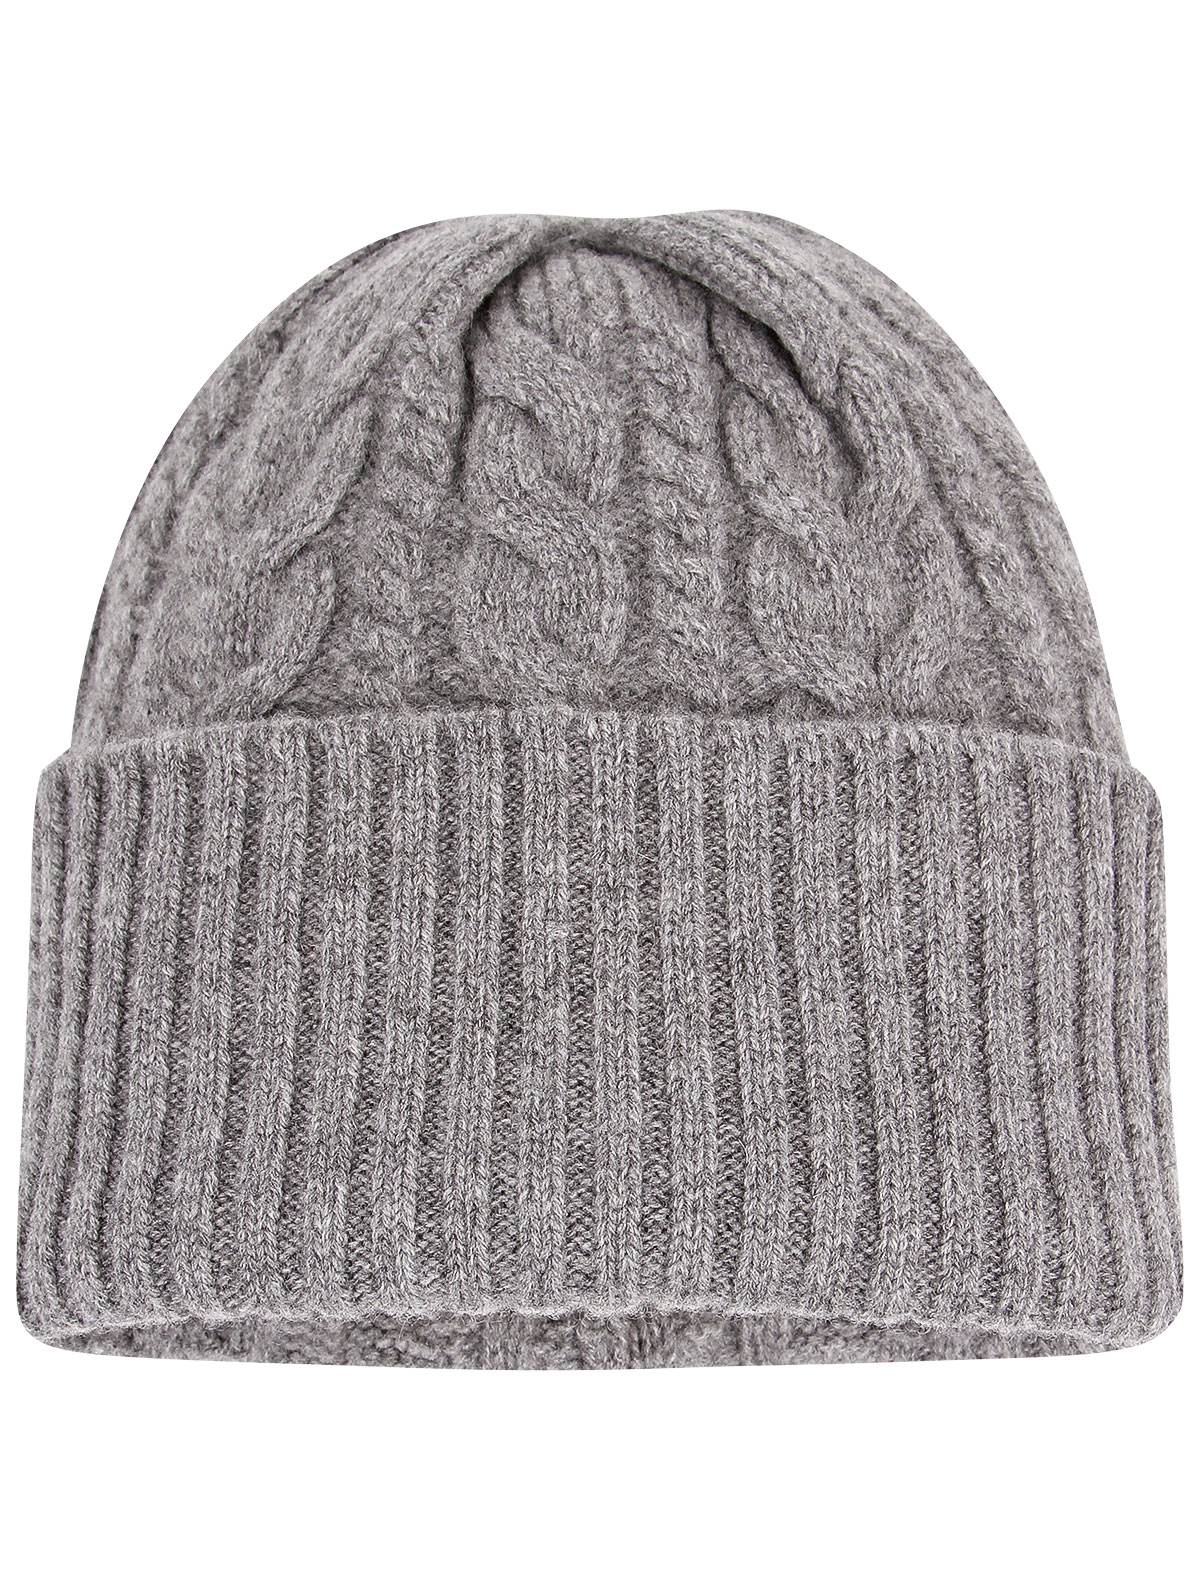 Купить 2249819, Шапка Air wool, серый, 1354529081033